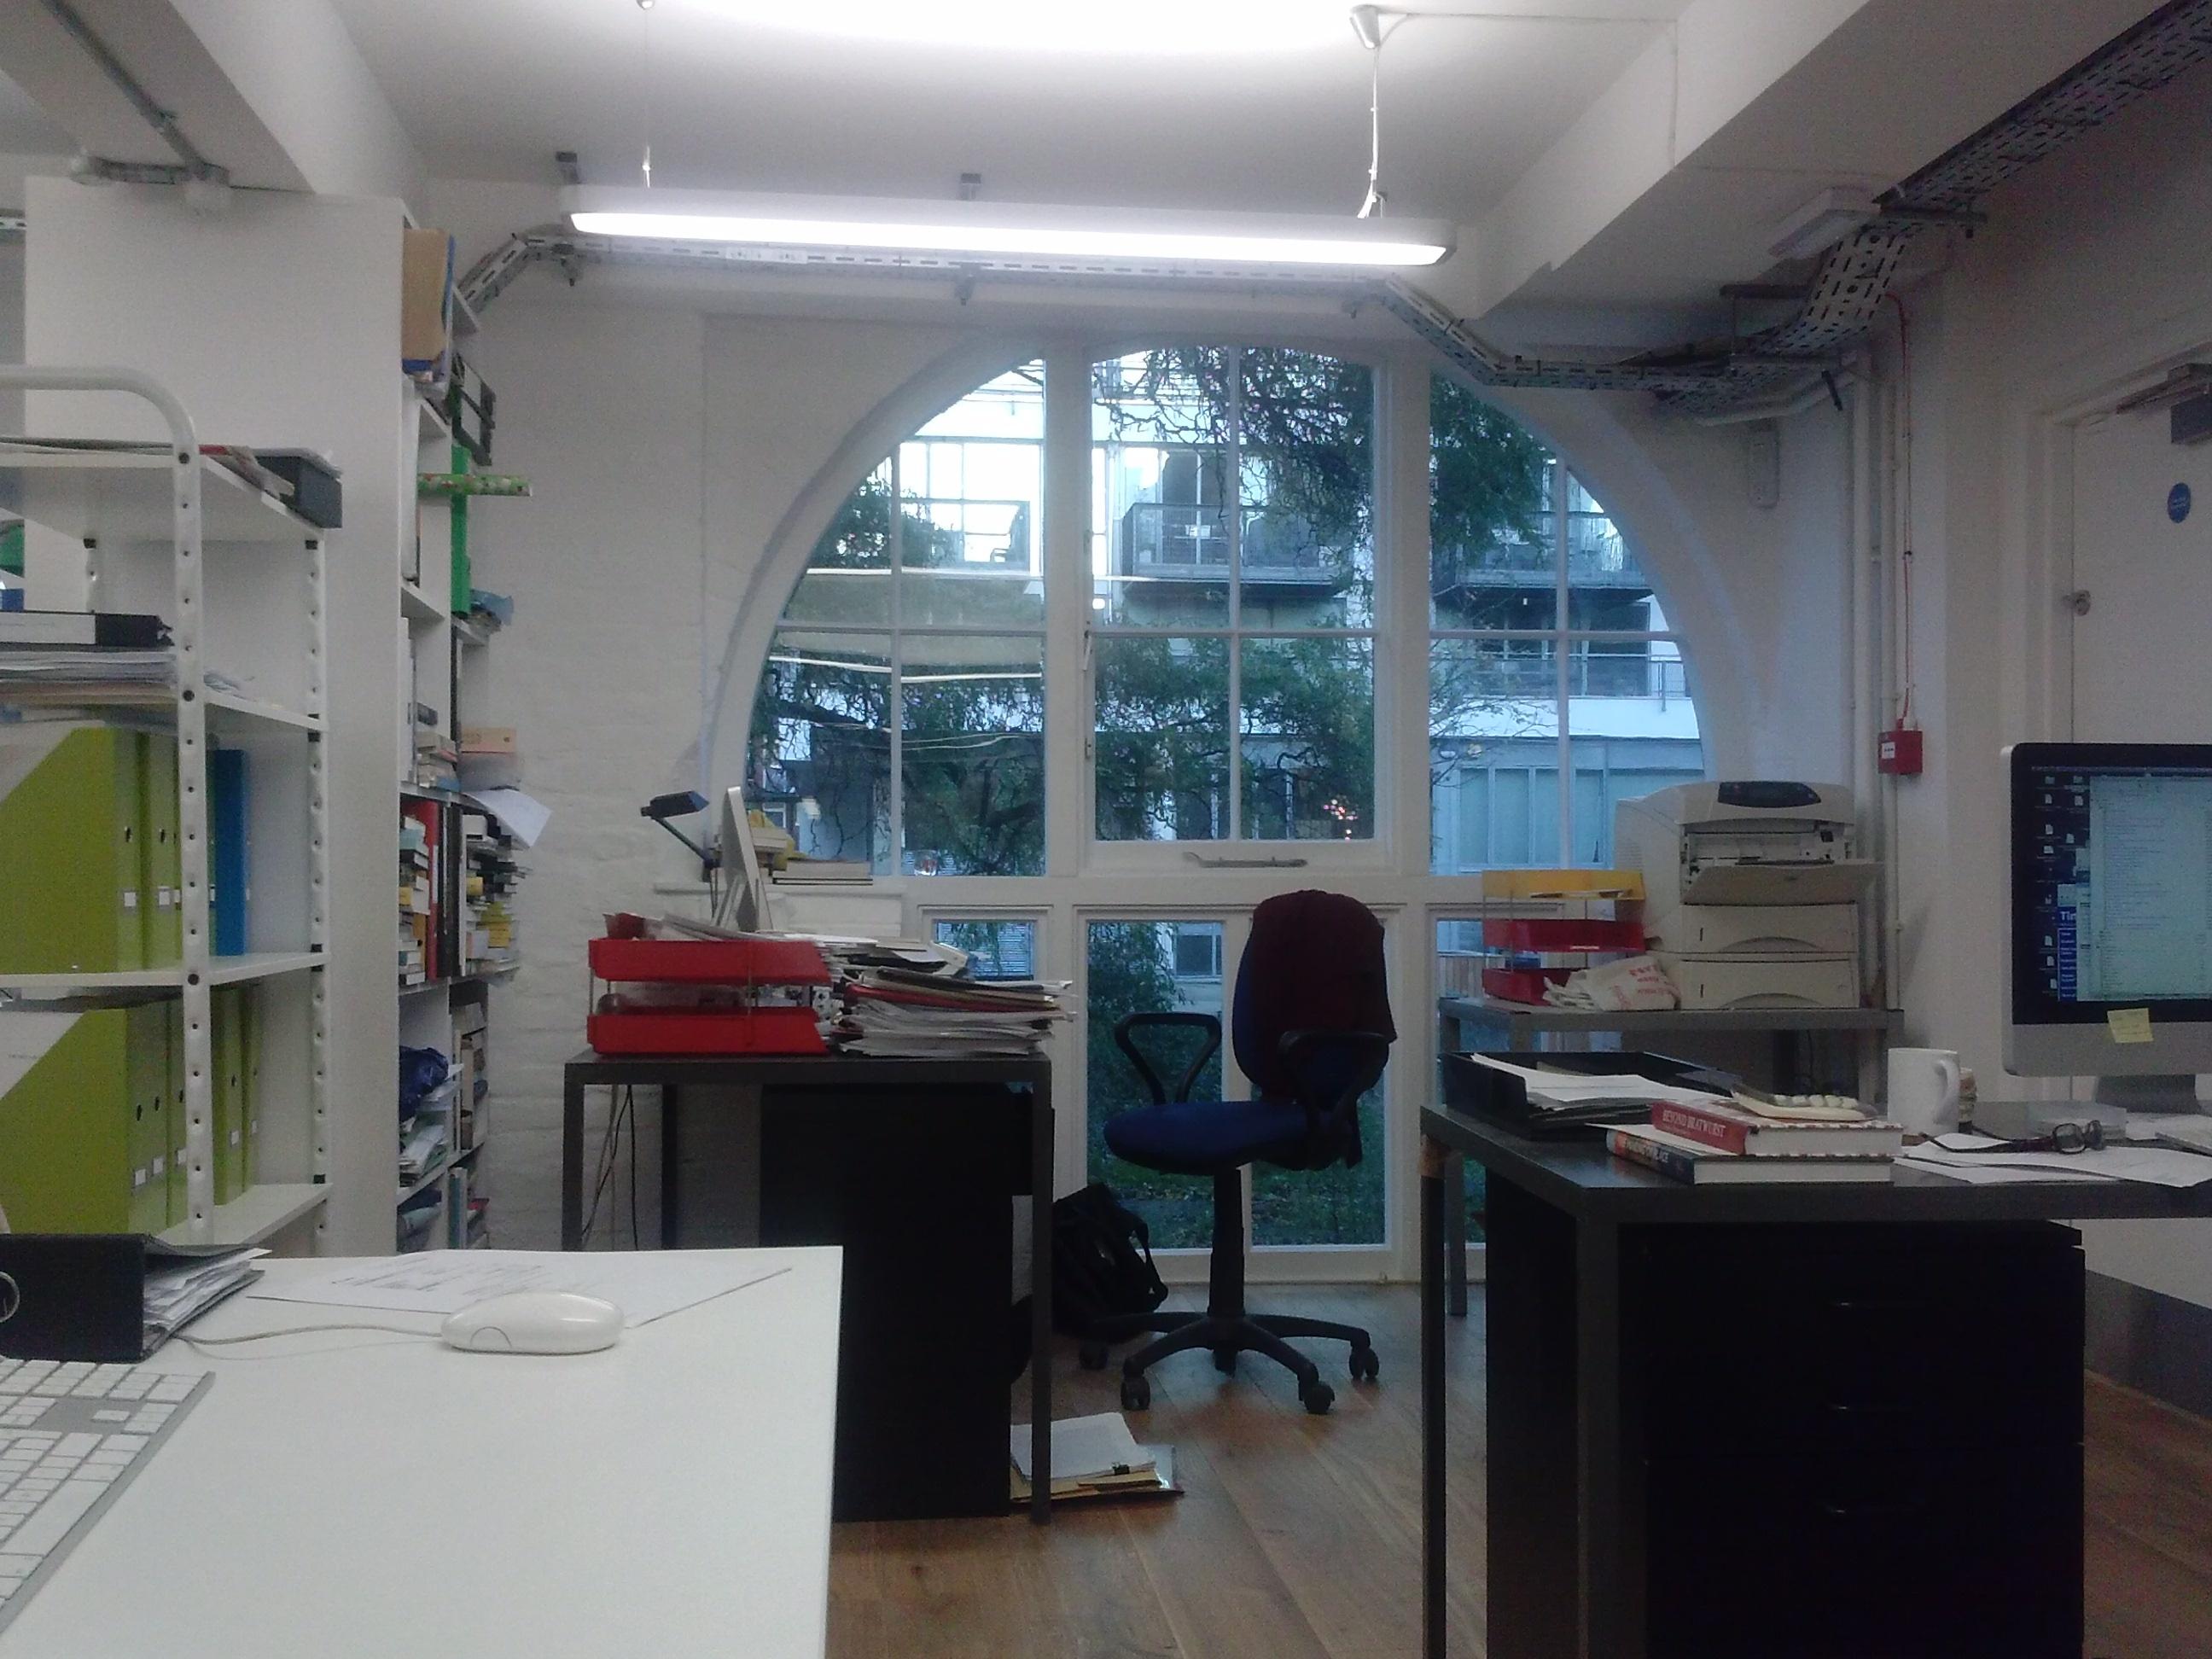 CAPAStudyAbroad_London_Fall2015_From_Alyssa_Reimenschneider_-_Internship_with_publishing_company1.jpg